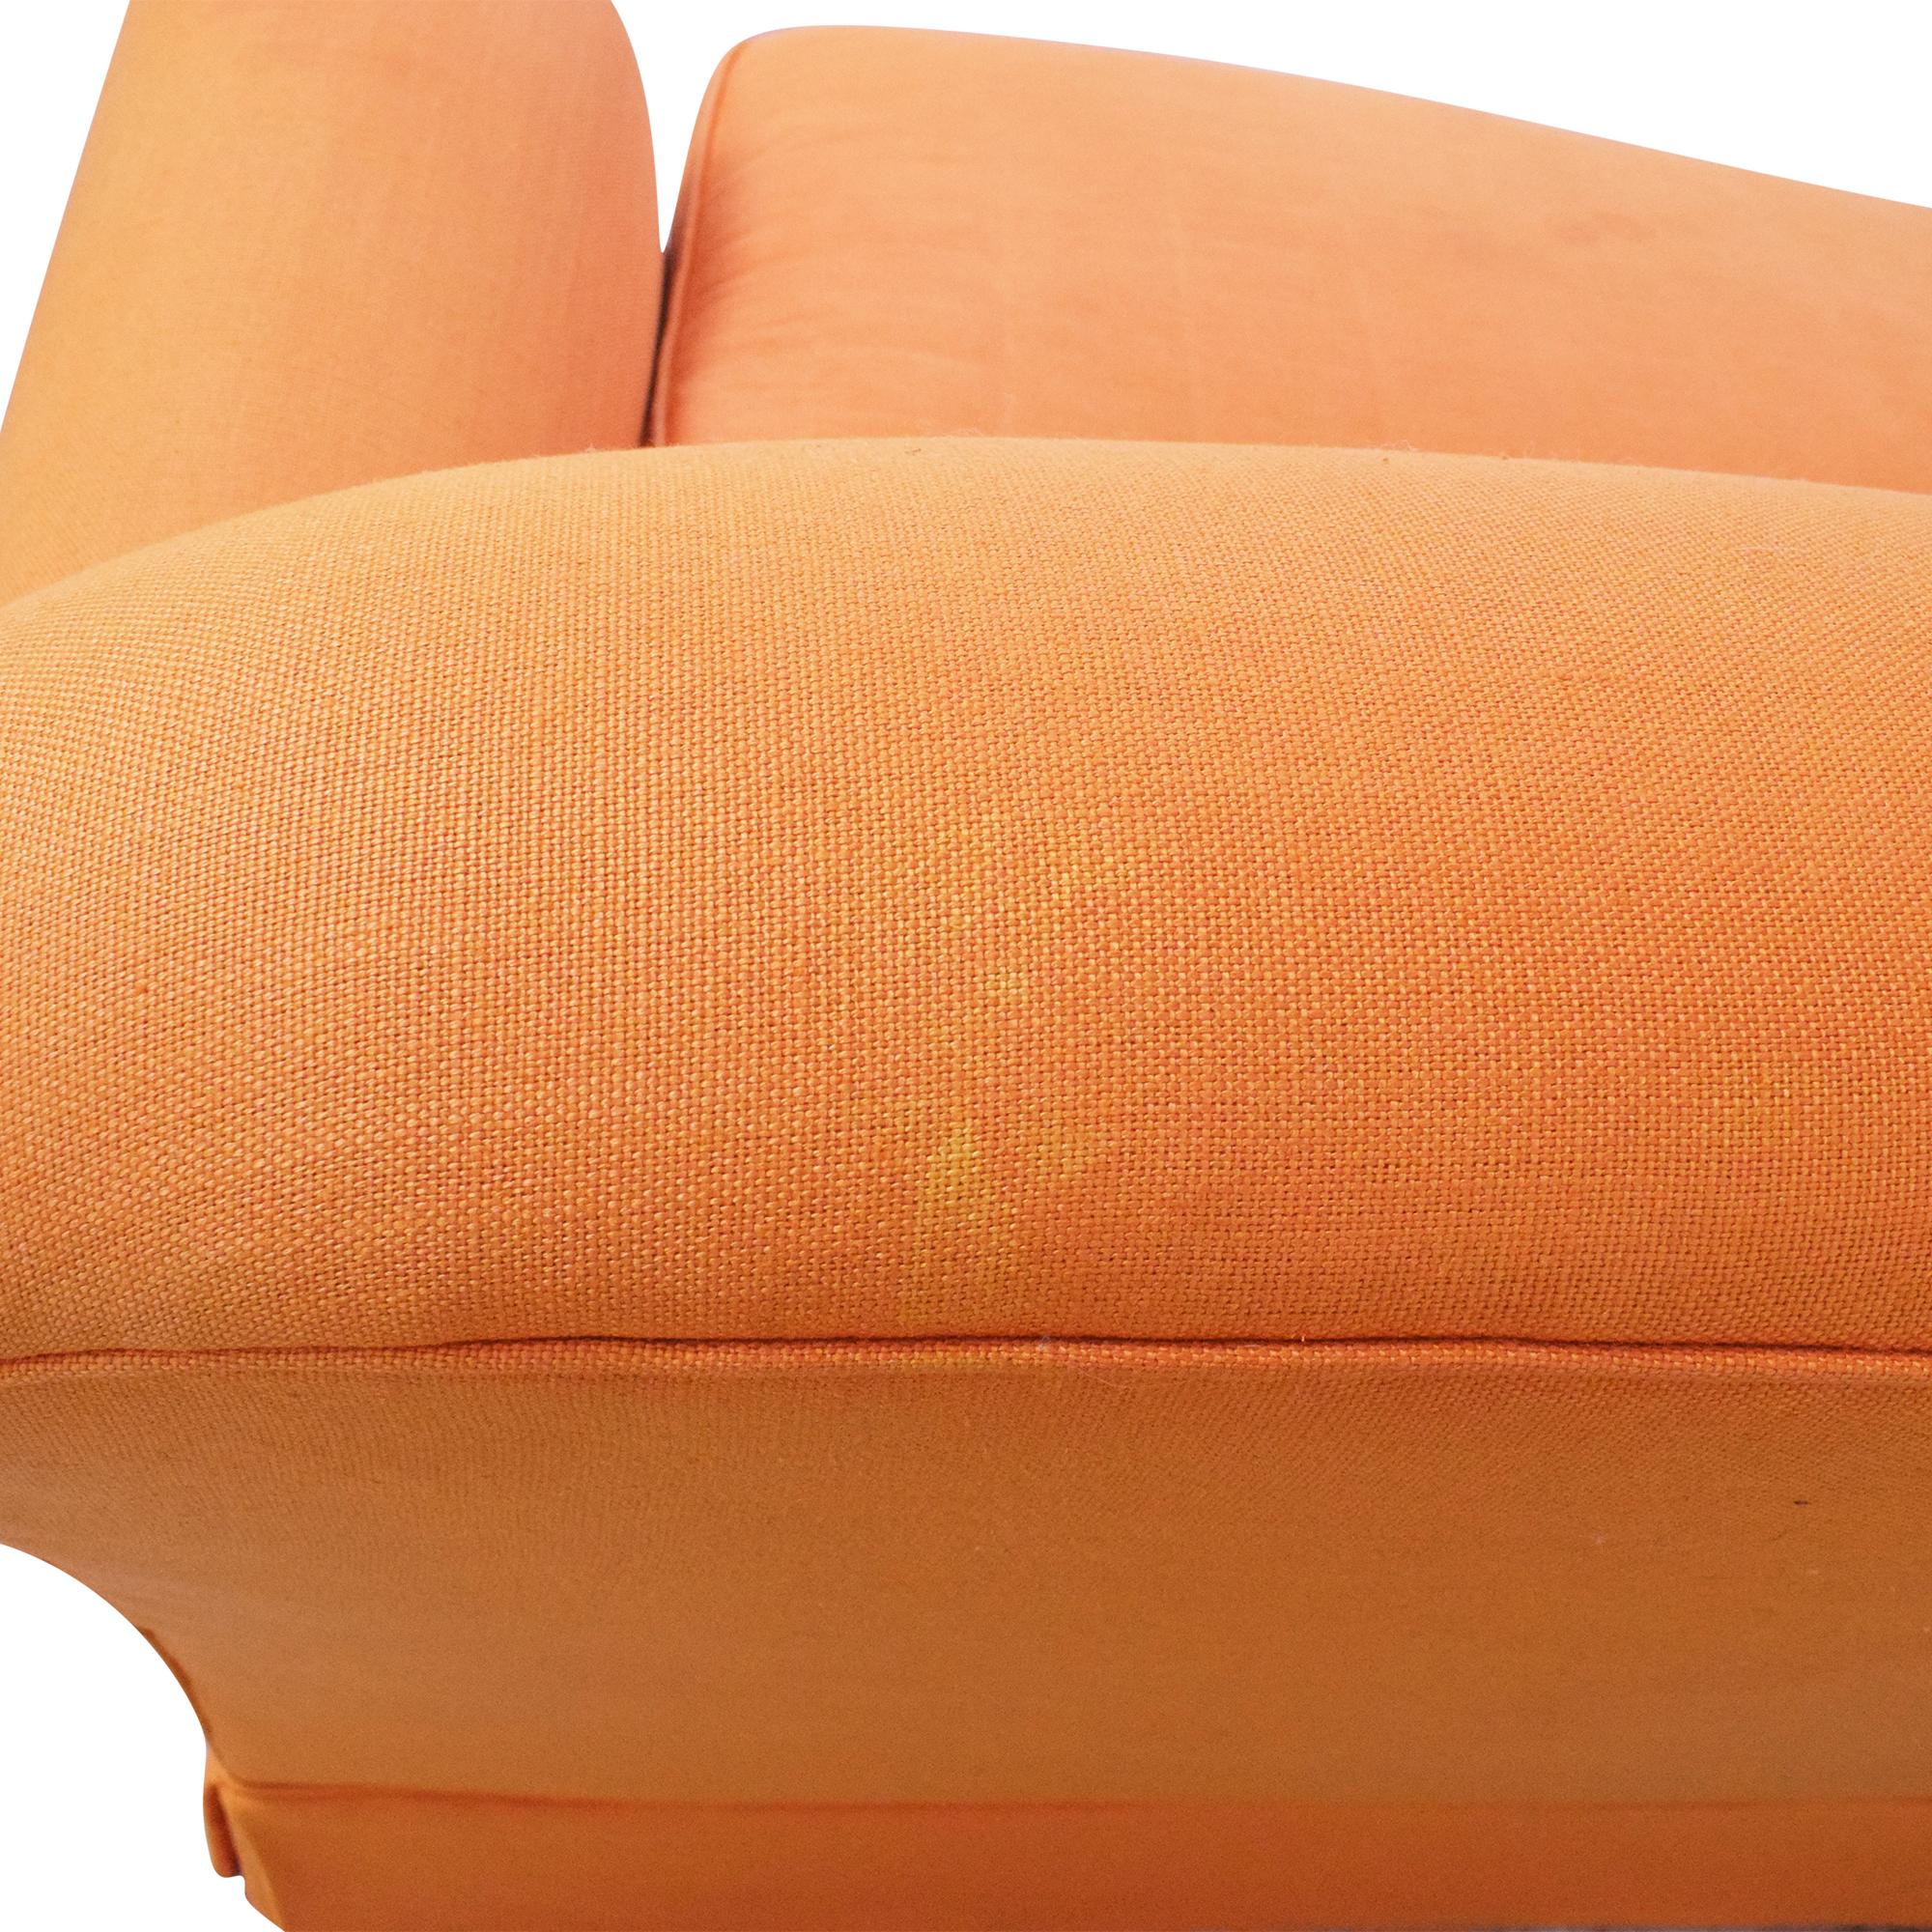 George Smith Bench Cushion Sofa sale